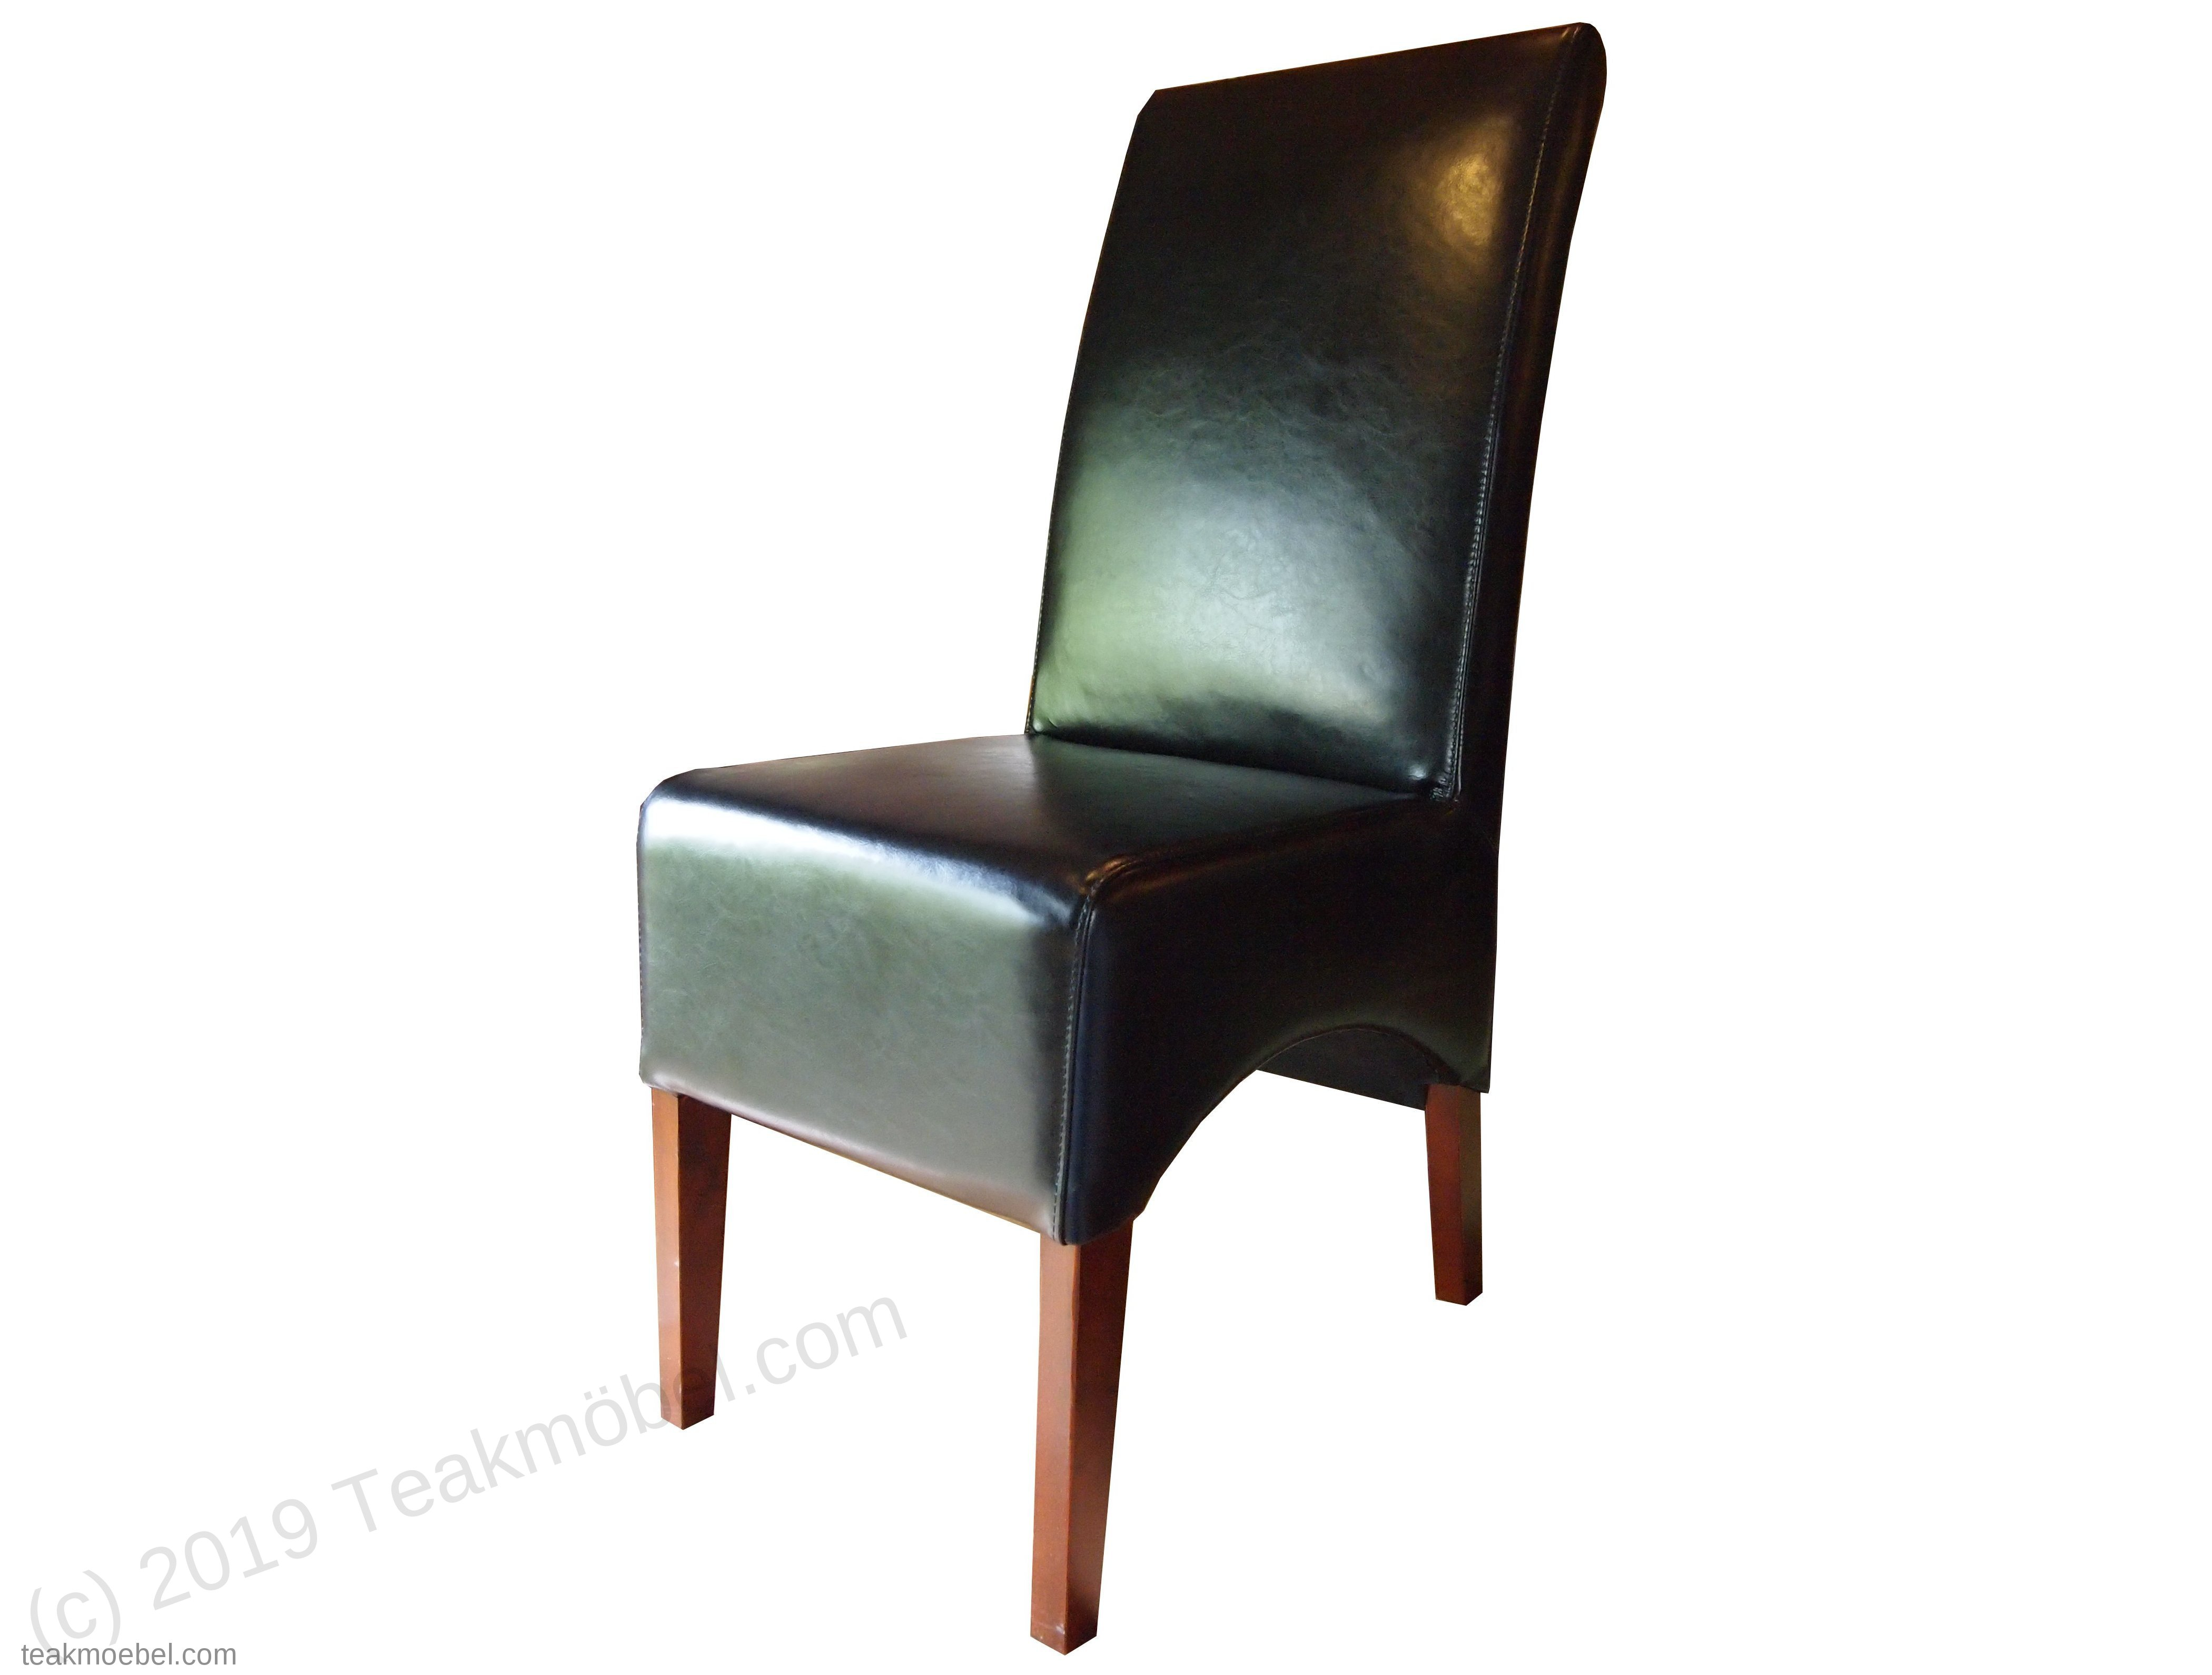 Leder stuhl schwarz teakm - Stuhl leder schwarz ...